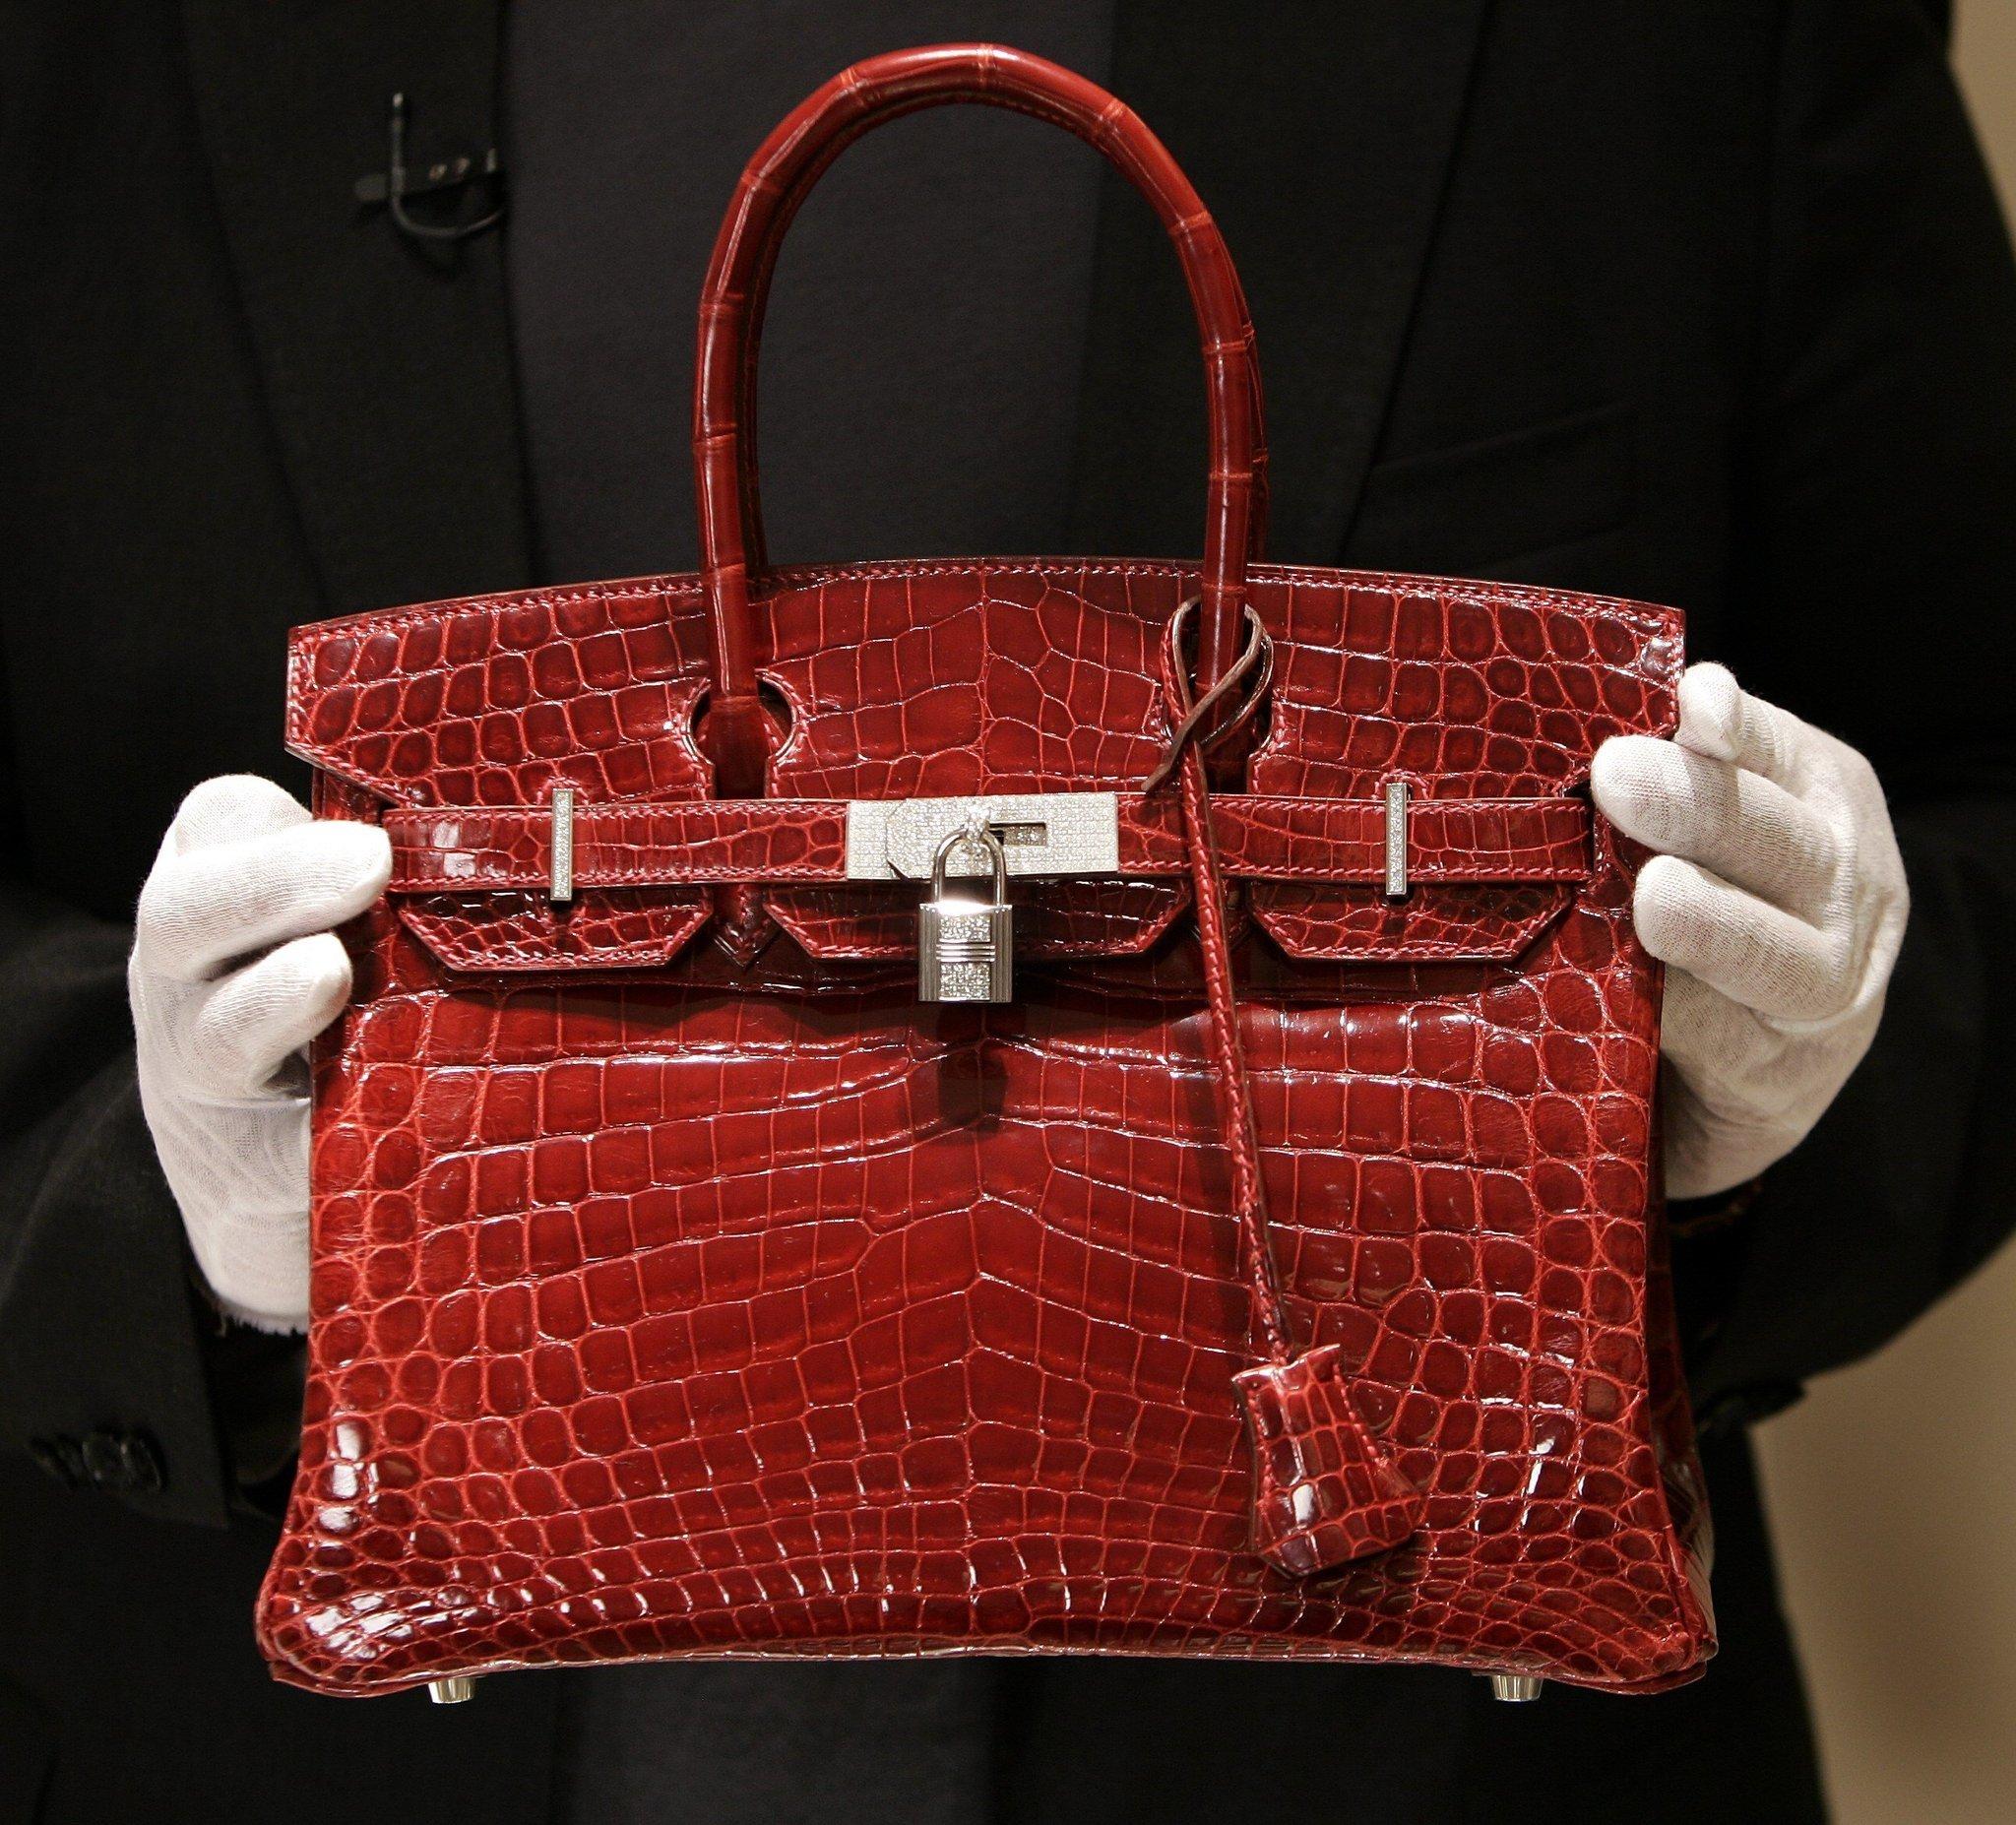 hermes birkin handbags price - Birkin bag: from status symbol to badge of shame - LA Times